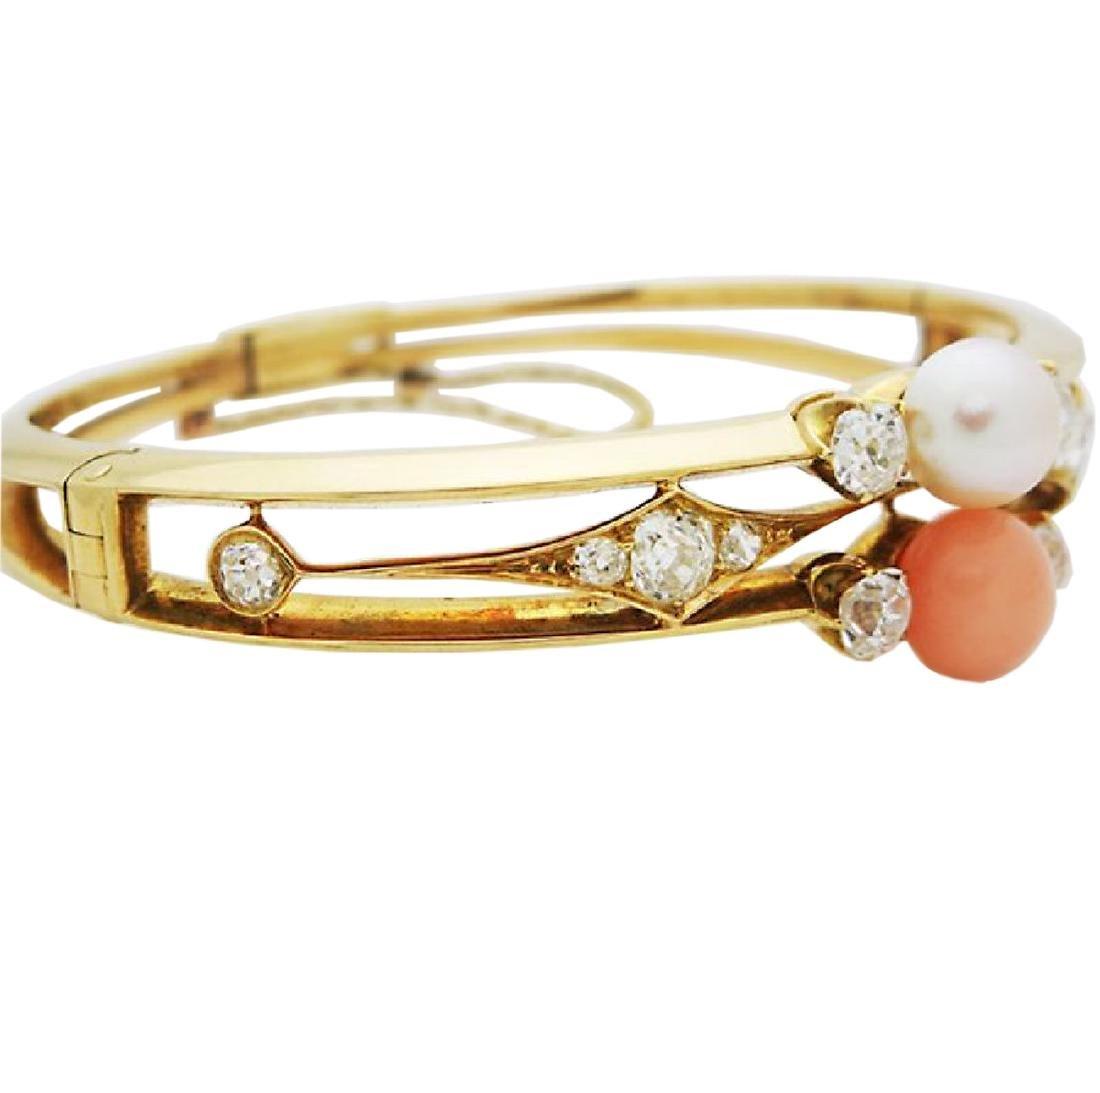 Antique 18K Gold natural Pearl, Coral Diamond Bracelet - 3